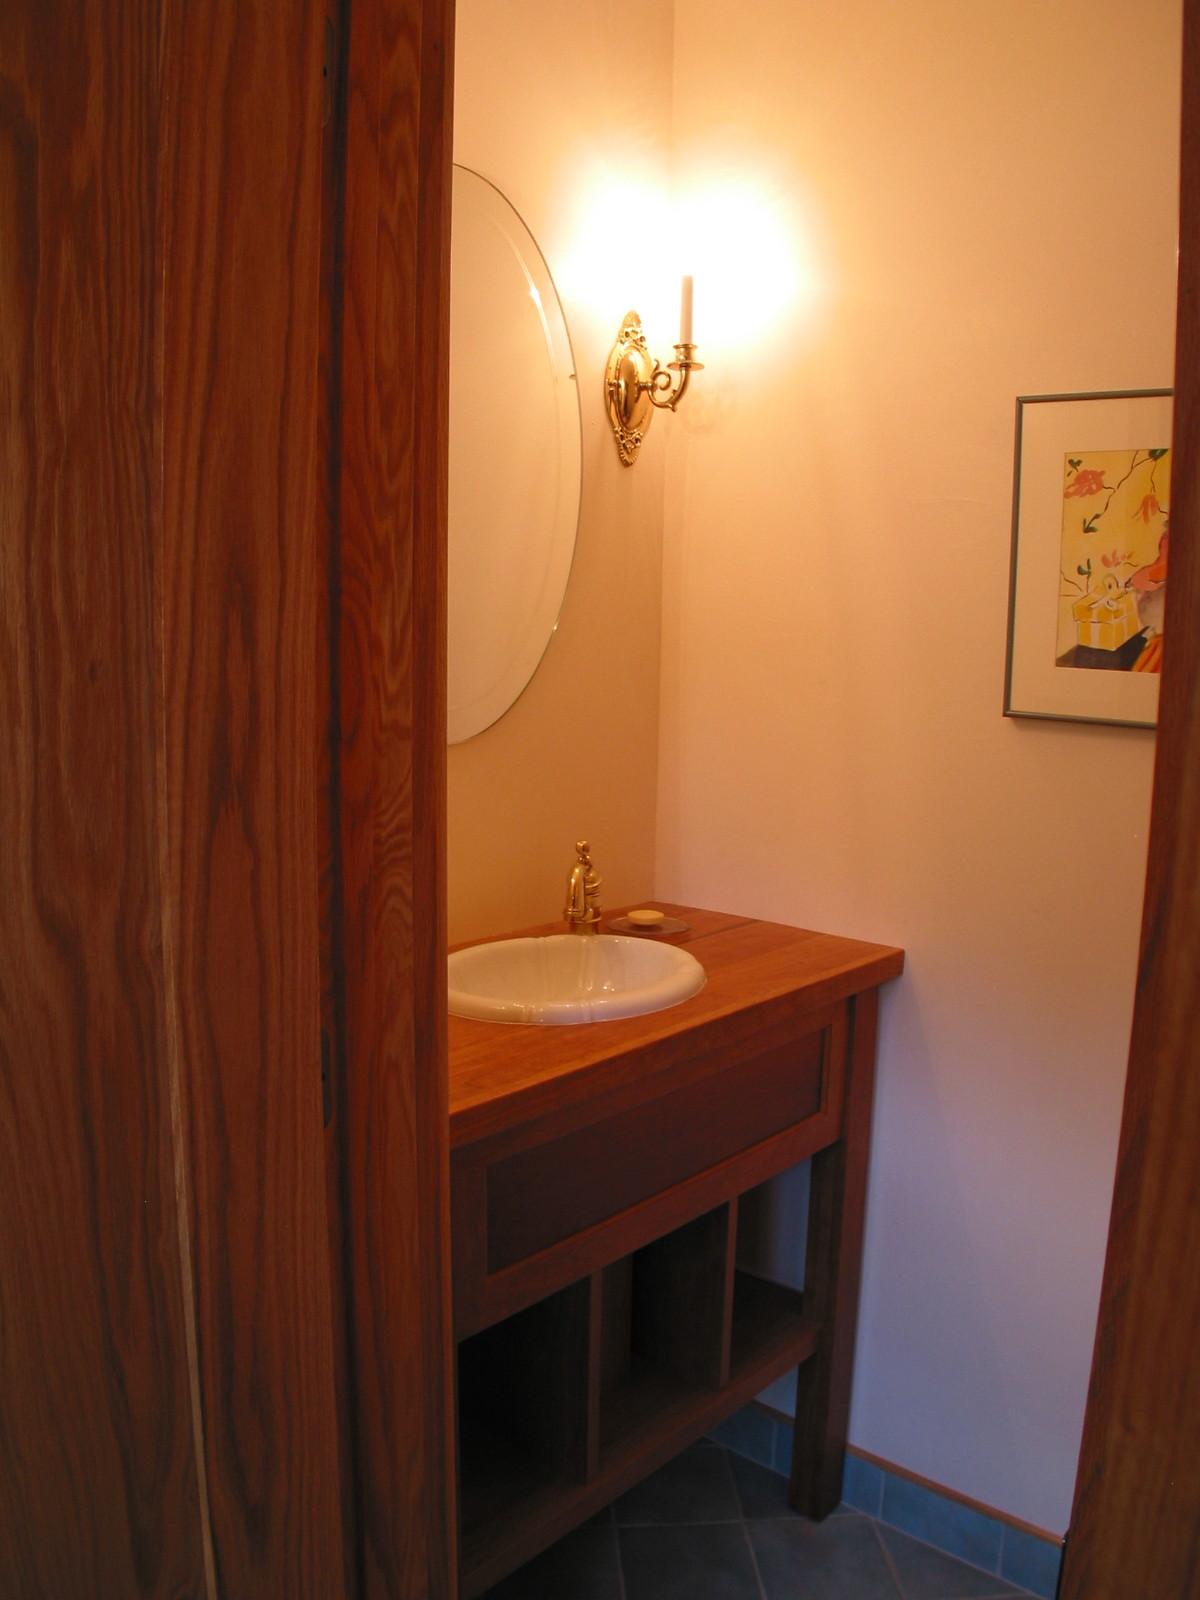 Whole-Builders-Bath-Remodel-1323